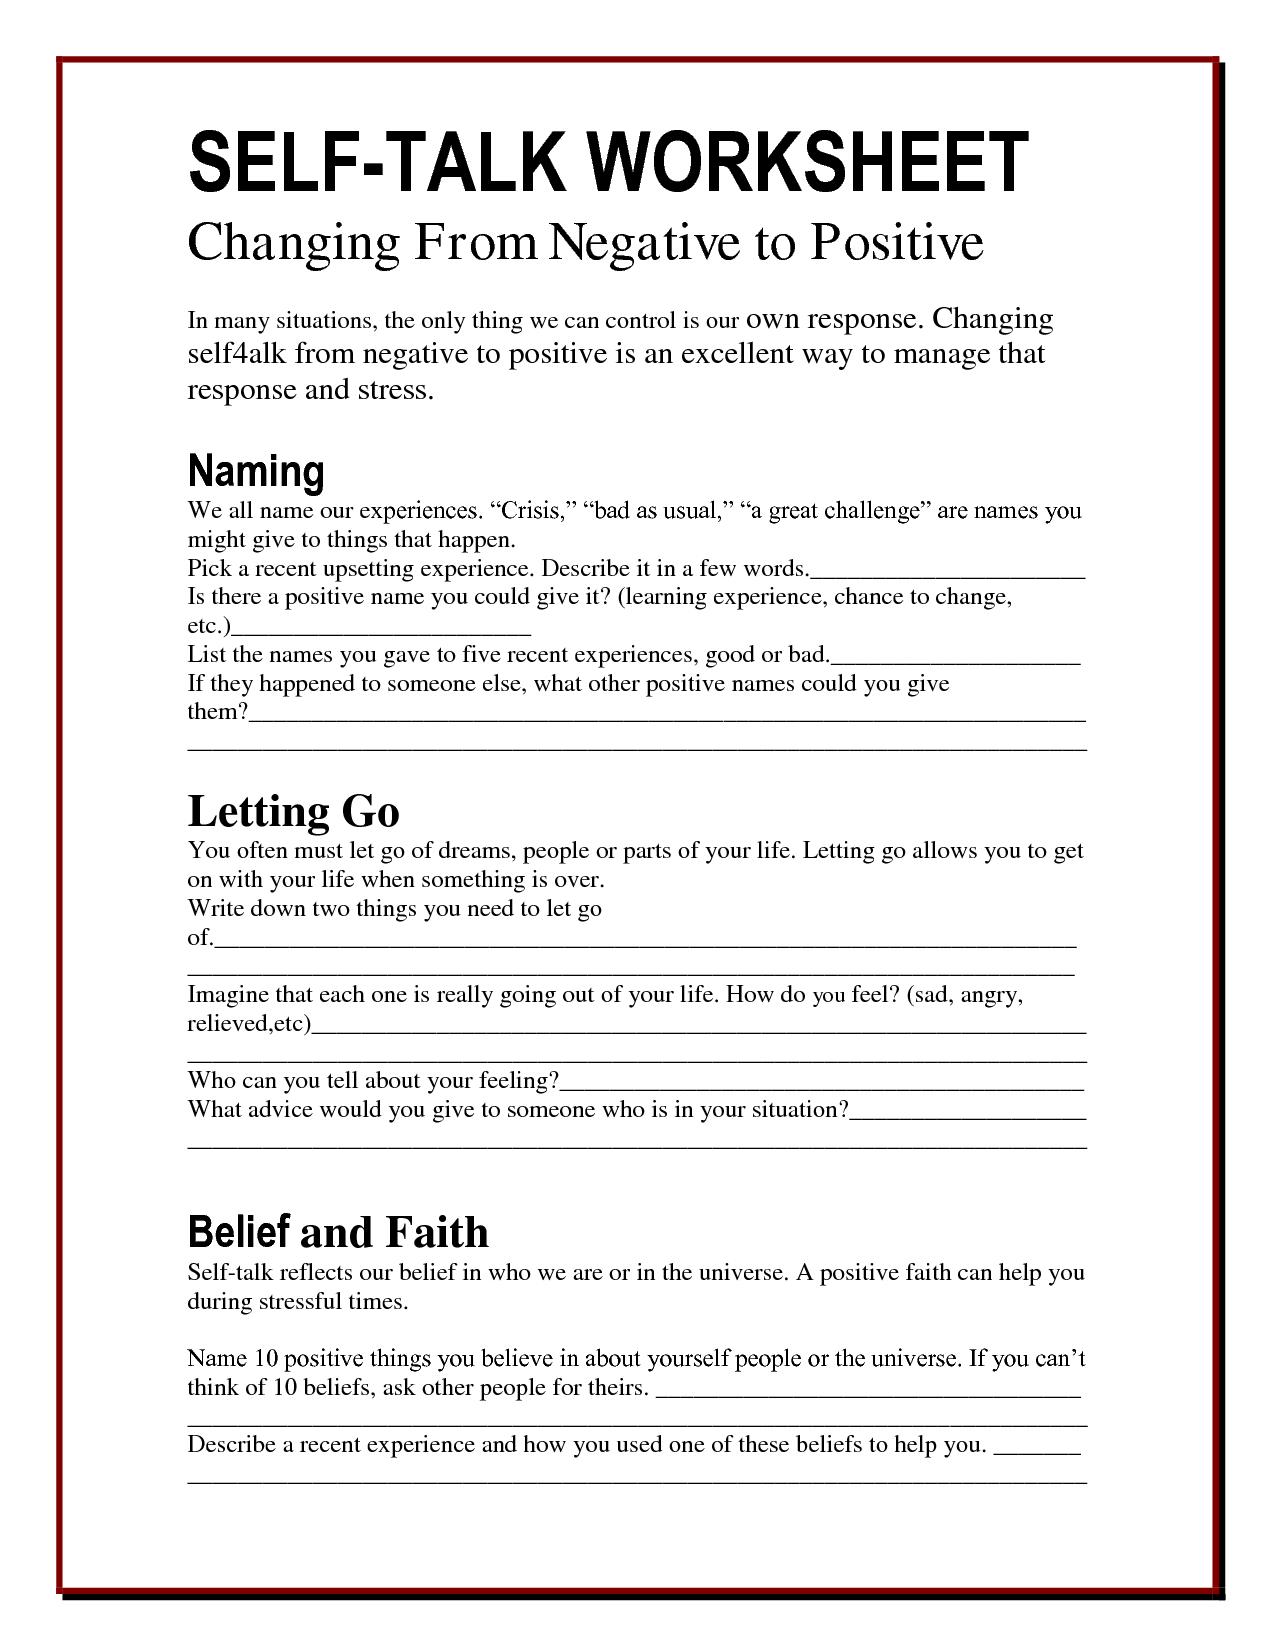 25 Cbt Techniques And Worksheets For Cognitive Behavioral